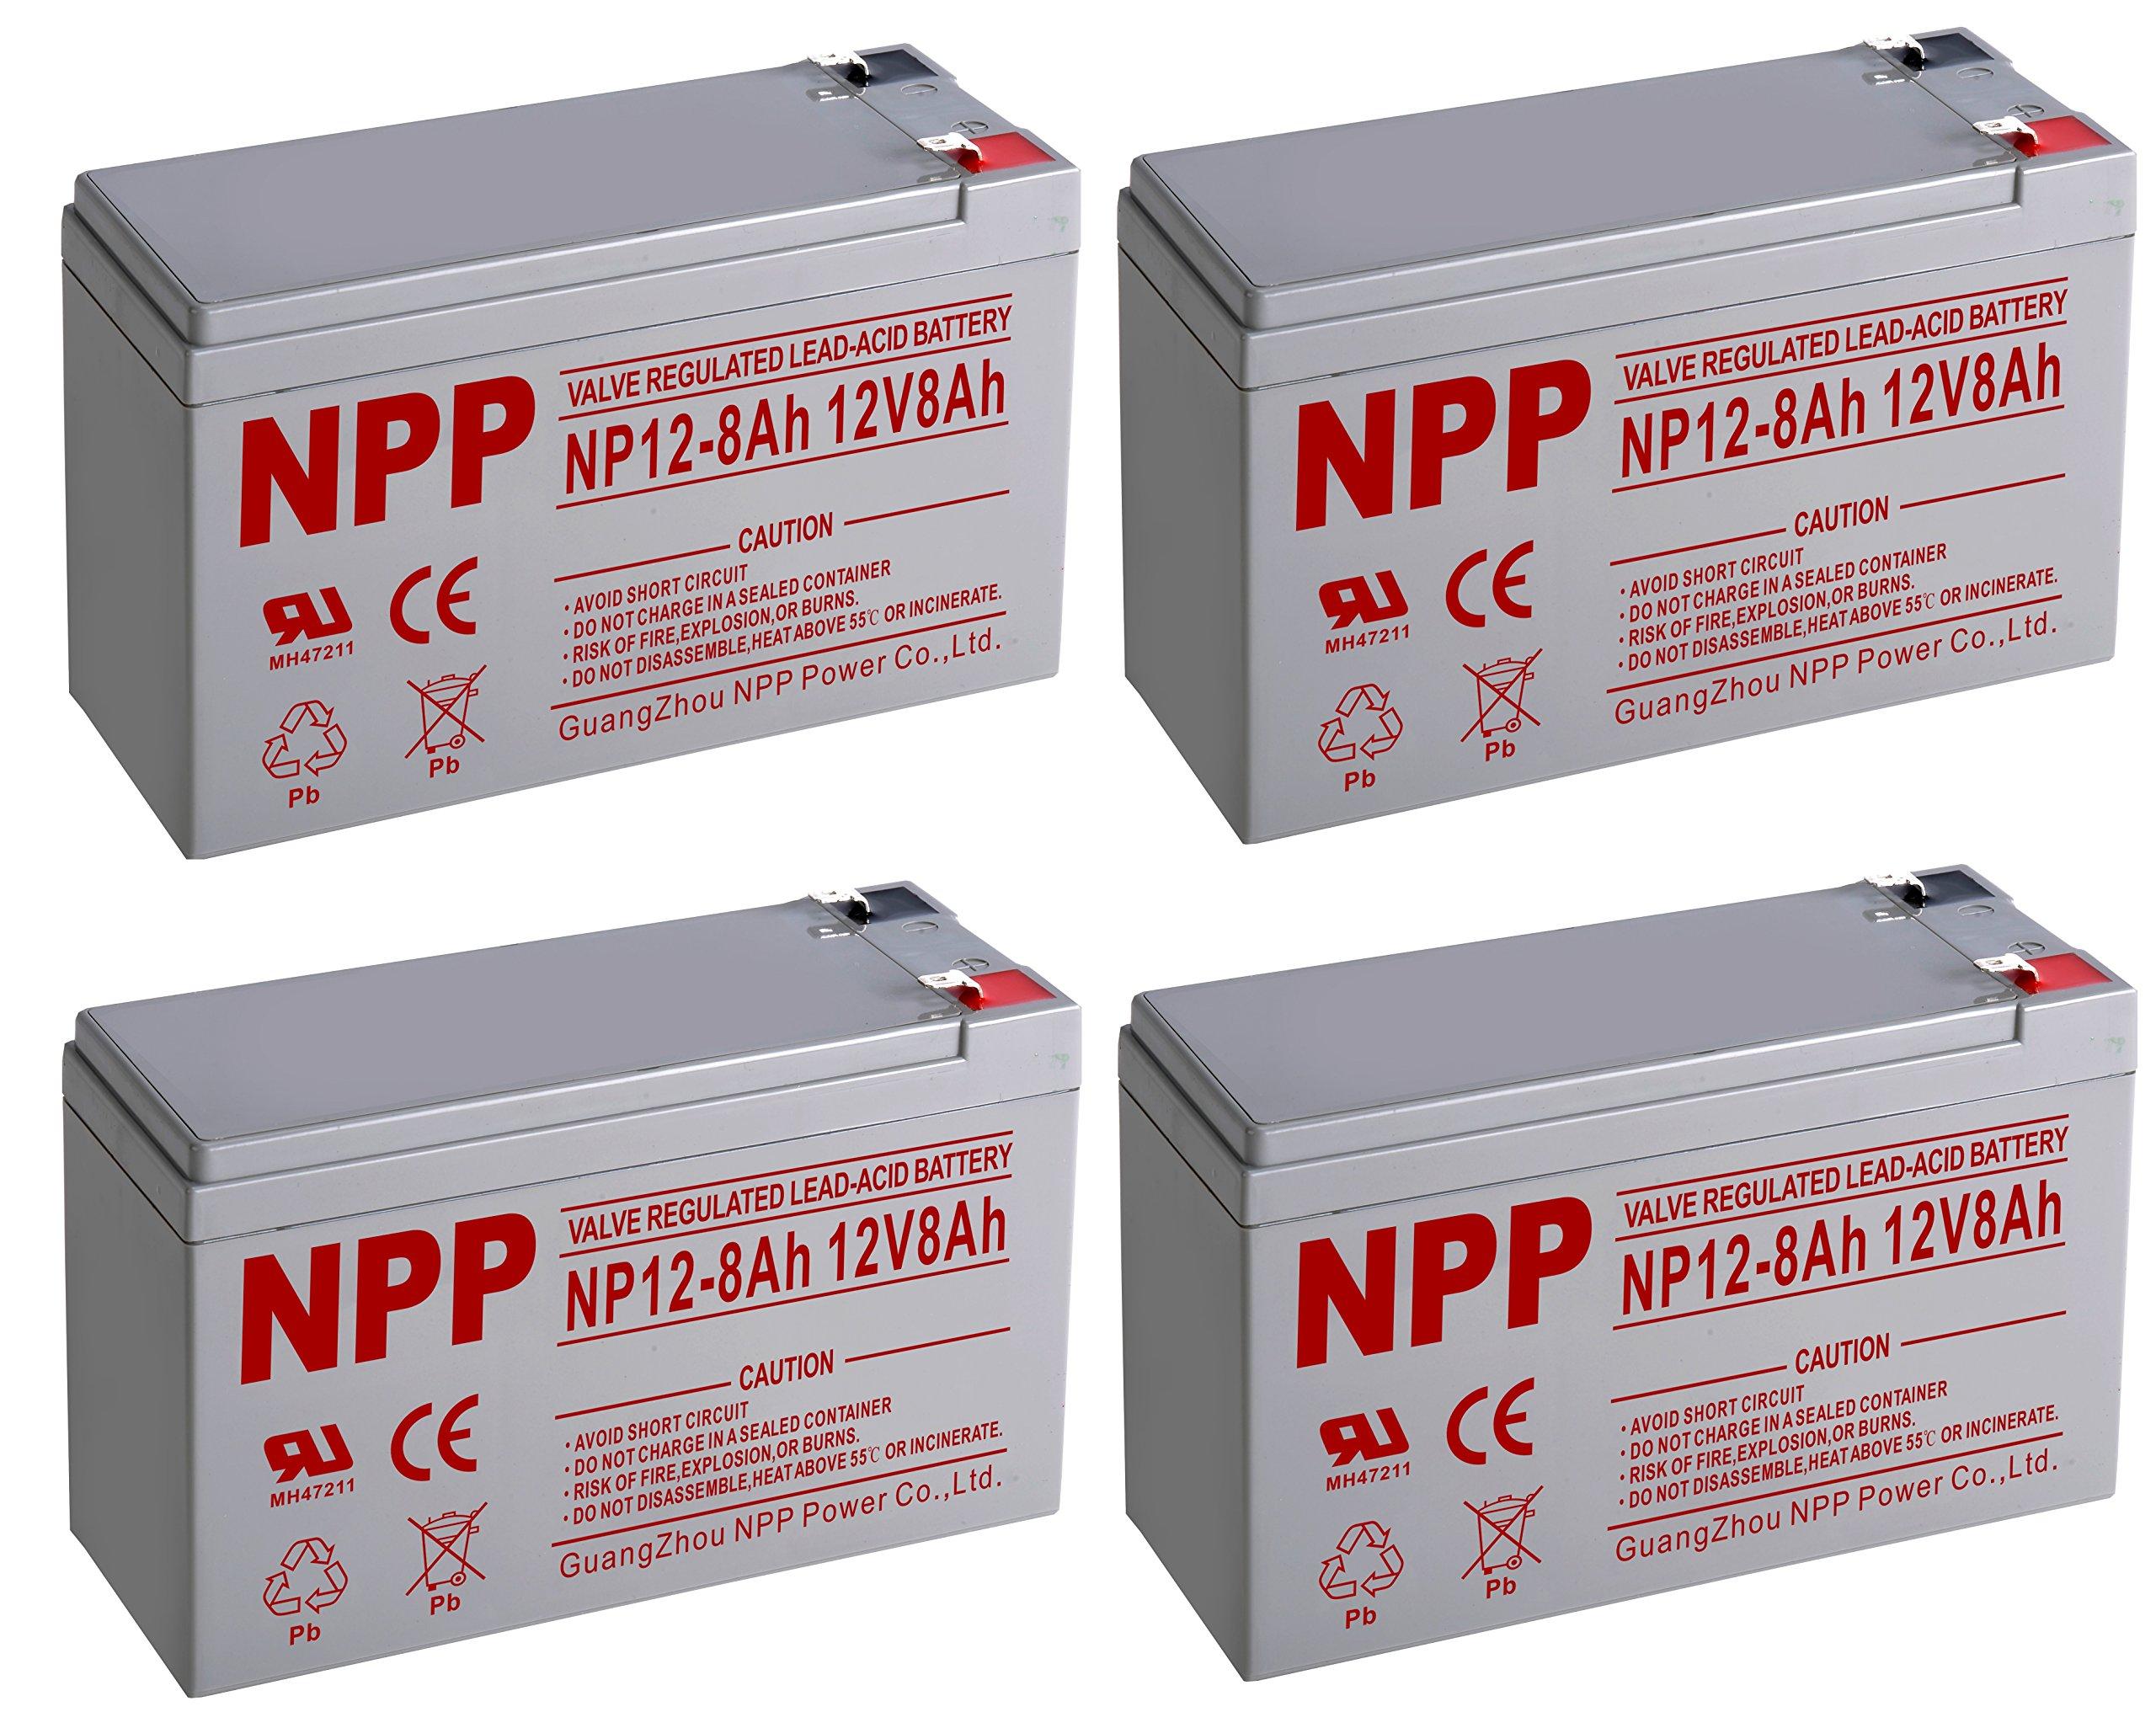 NPPower NP12-8Ah SLA Sealed Lead Acid 12V 8Ah Battery F1 Style Terminals/(4pcs)